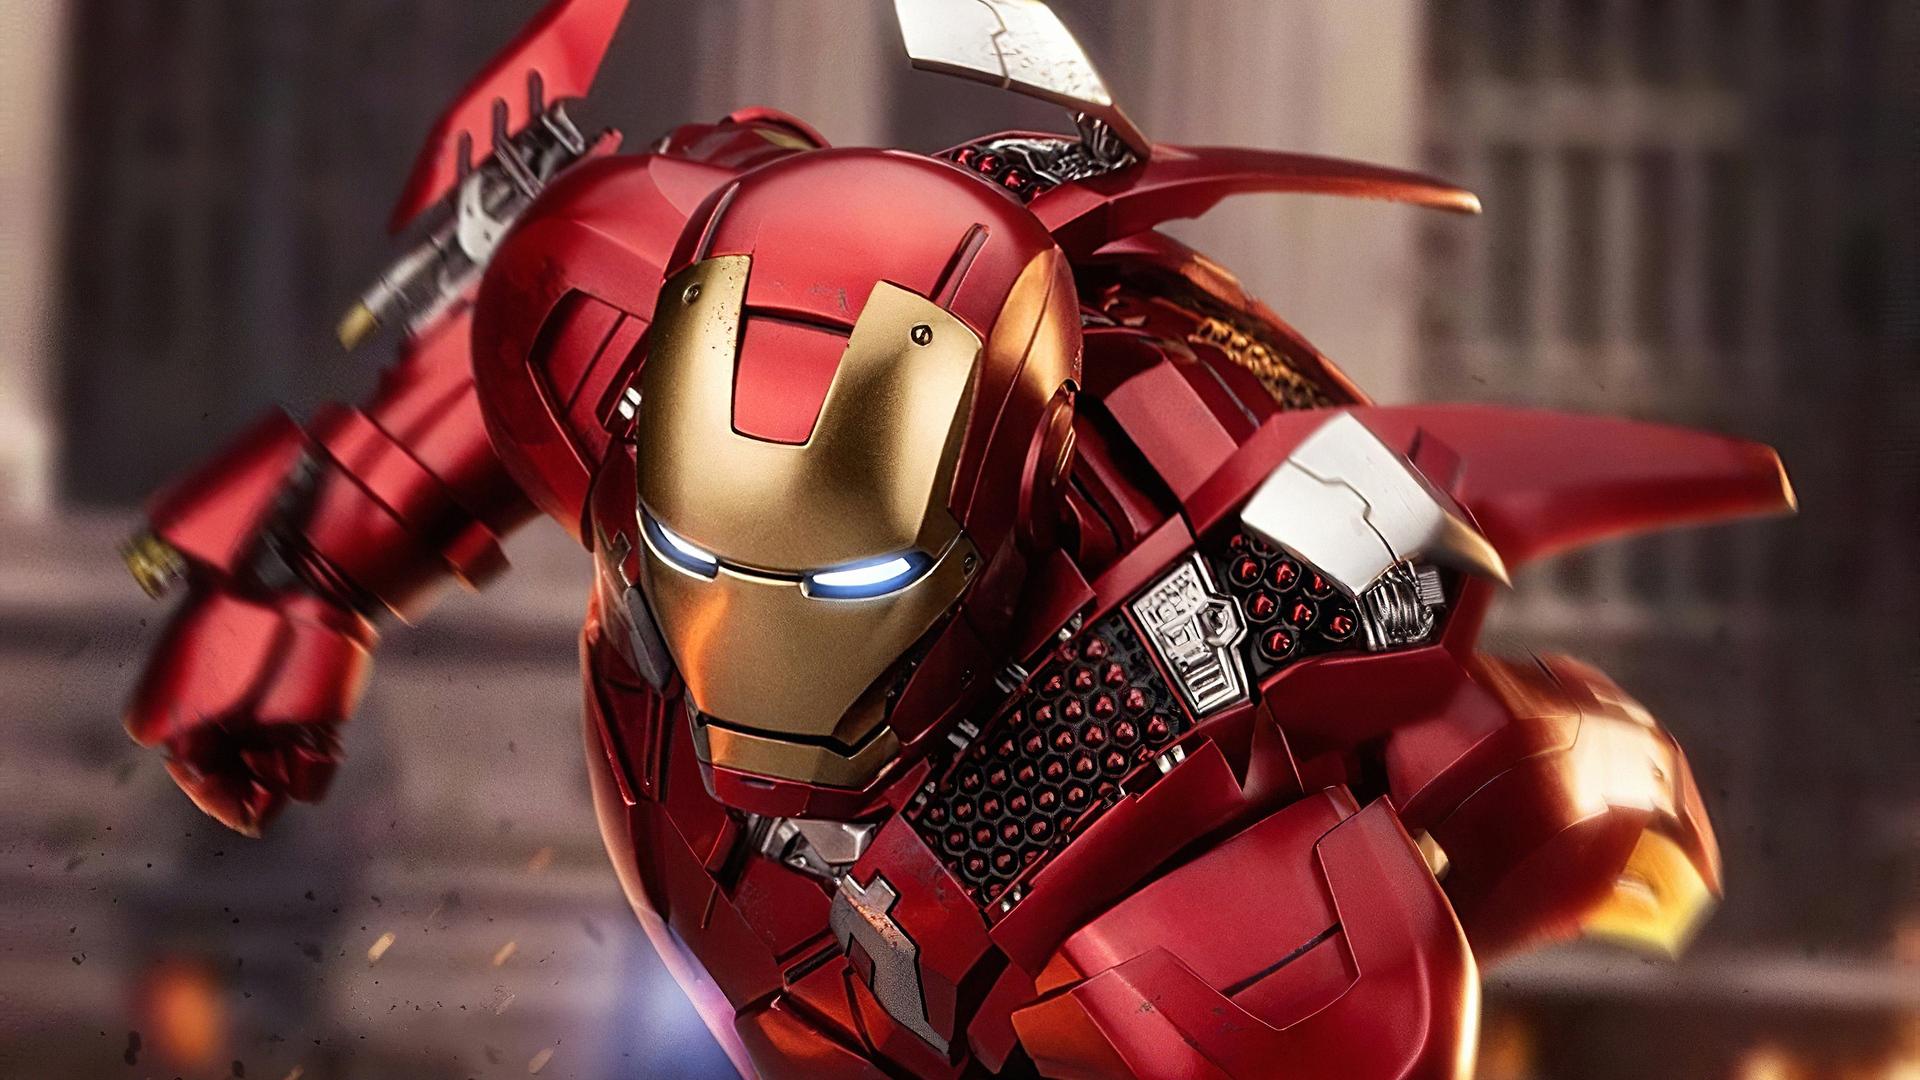 1920x1080 Iron Man4knew Laptop Full HD 1080P HD 4k ...